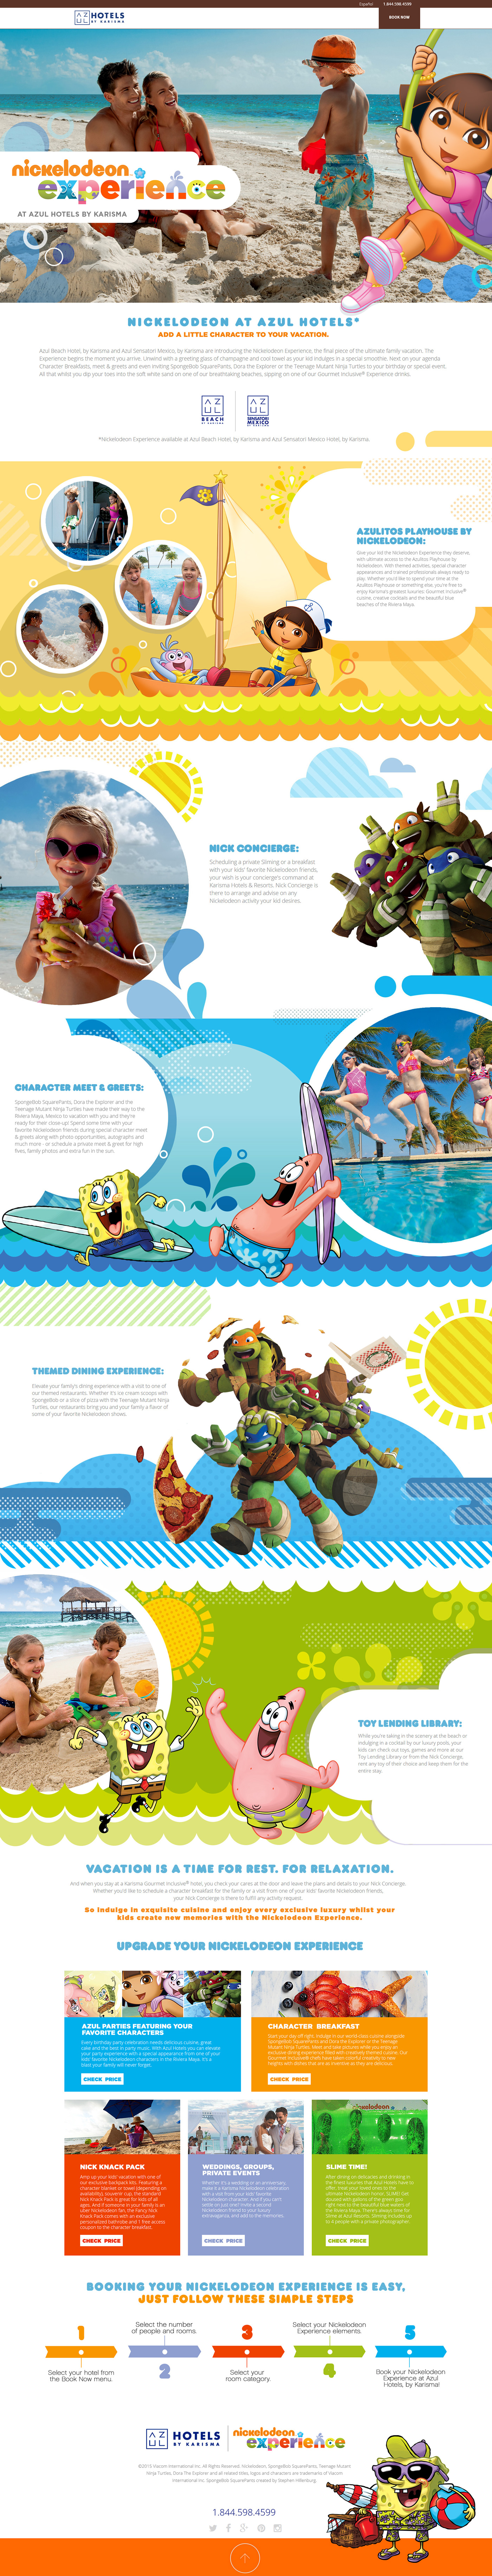 Nickelodeon Experience on Behance